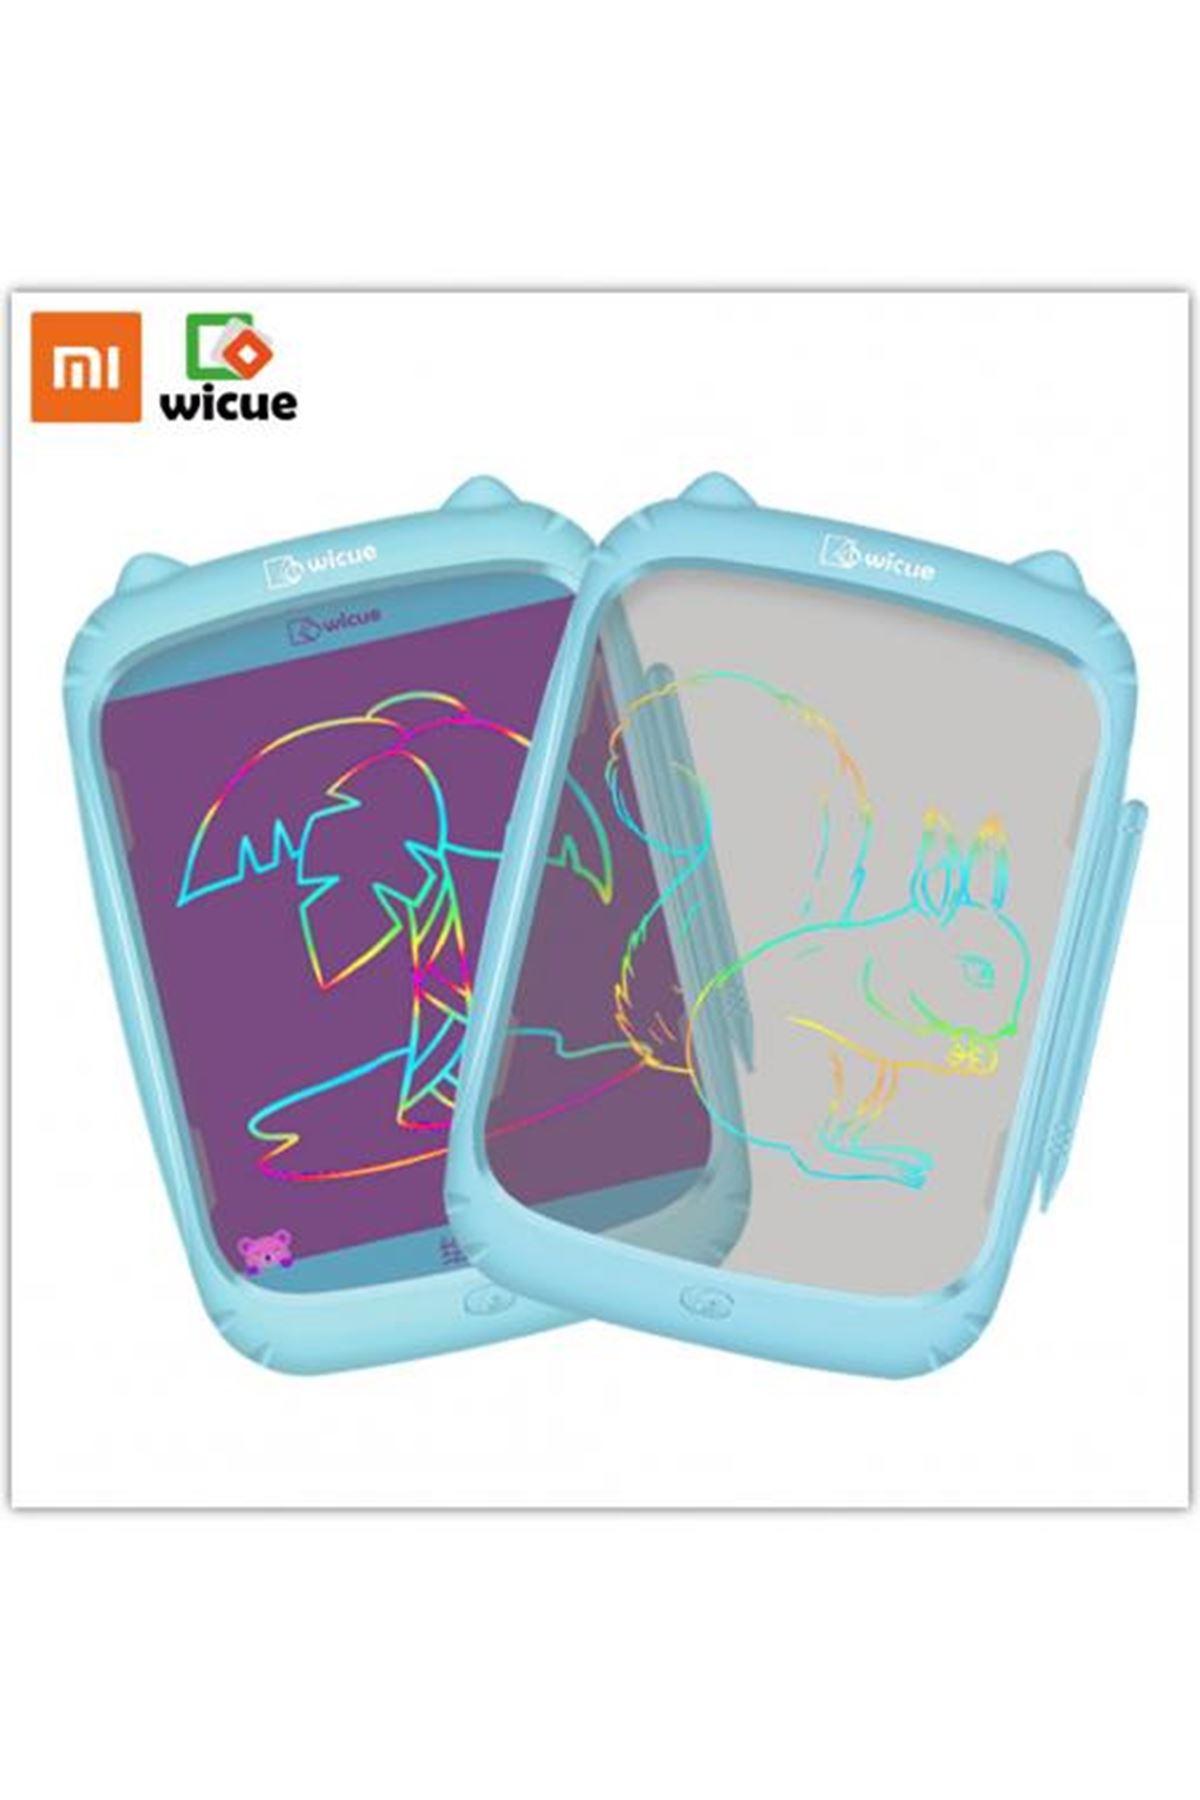 Xiaomi Wicue 11 Saydam LCD Dijital Eğitim Tableti Mavi